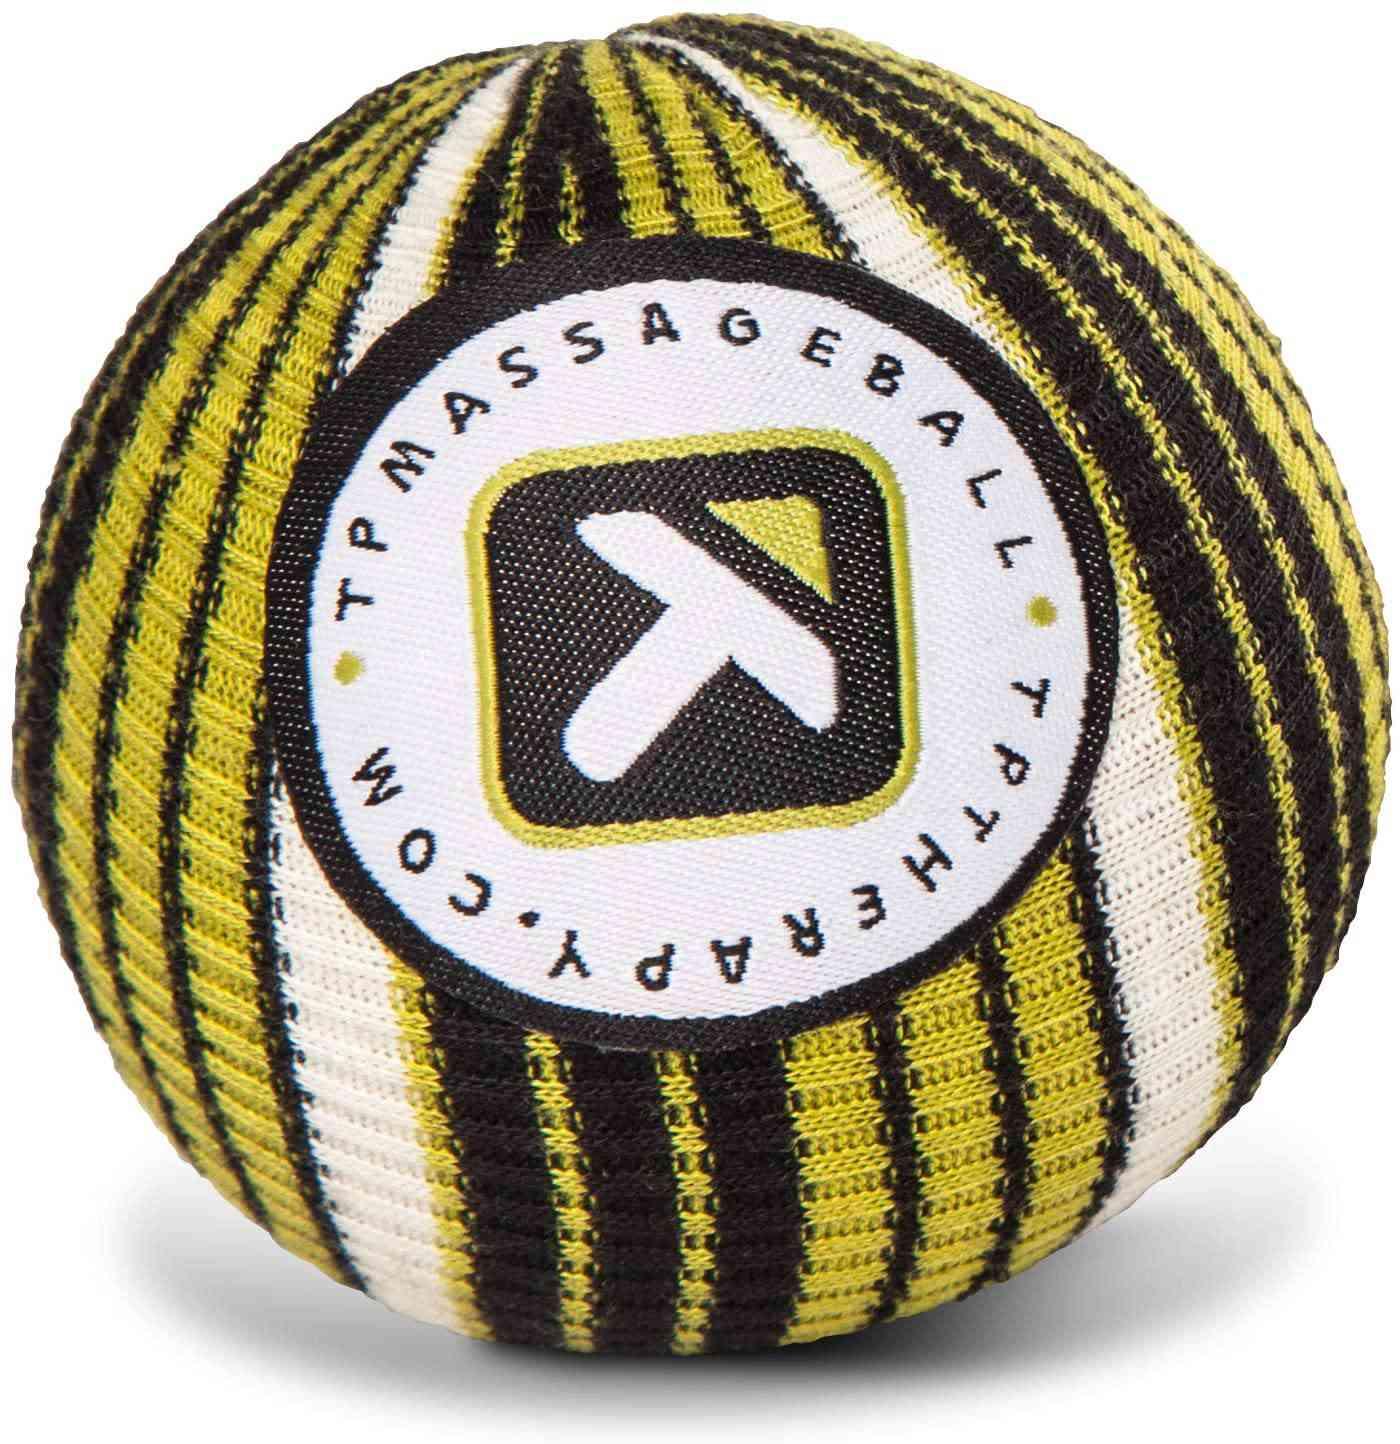 Trigger Point Performance Deep Tissue Massage Ball